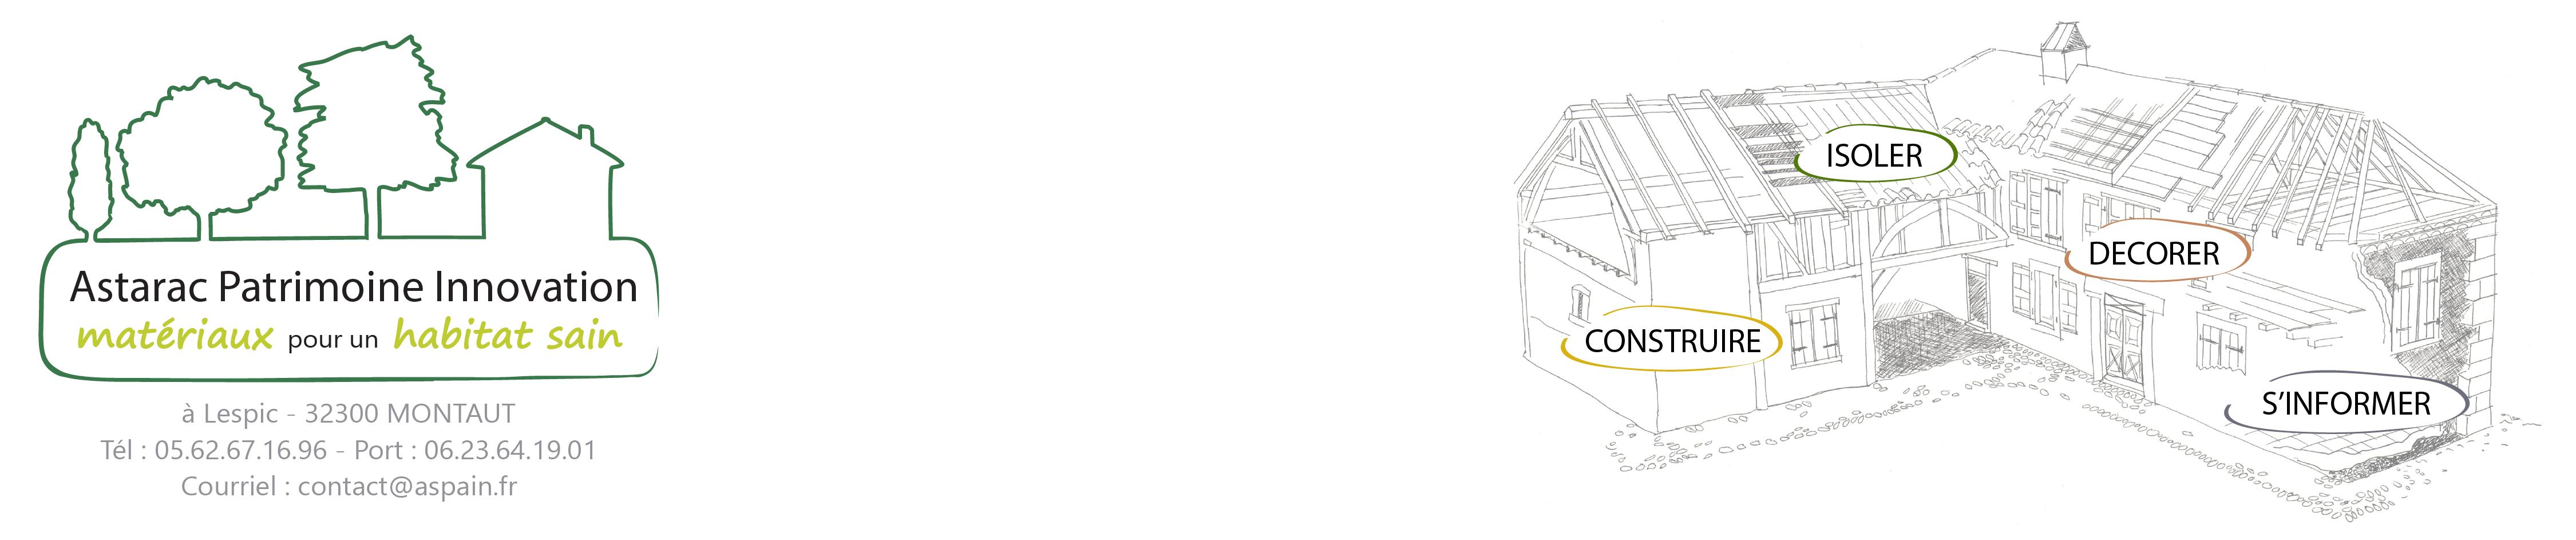 plan du site astarac patrimoine innovation. Black Bedroom Furniture Sets. Home Design Ideas